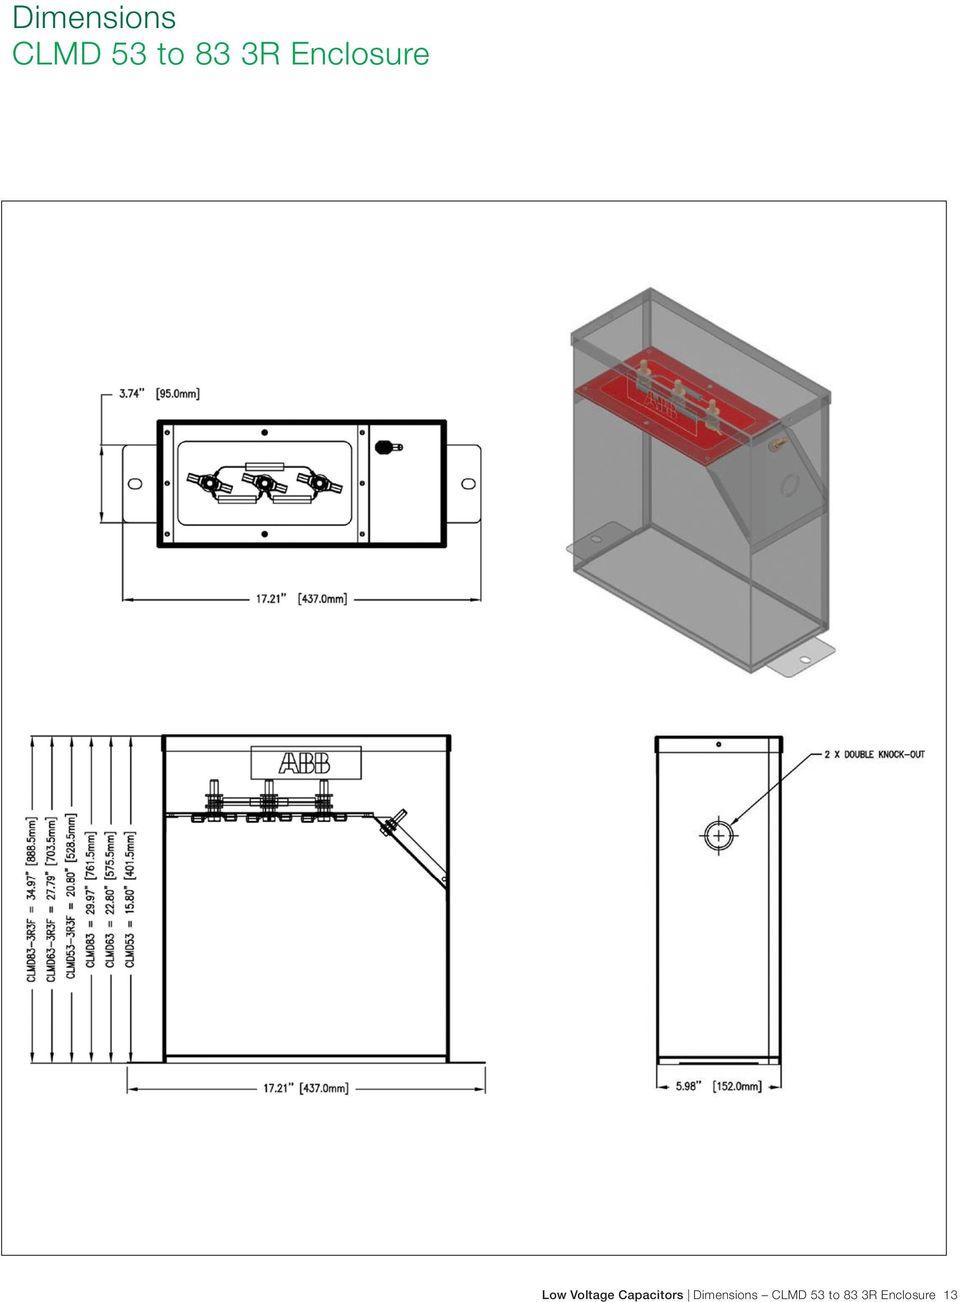 arco phase converter wiring diagram ge monogram refrigerator parts coo vipie de 3700 rod library rh 15 isugrads com